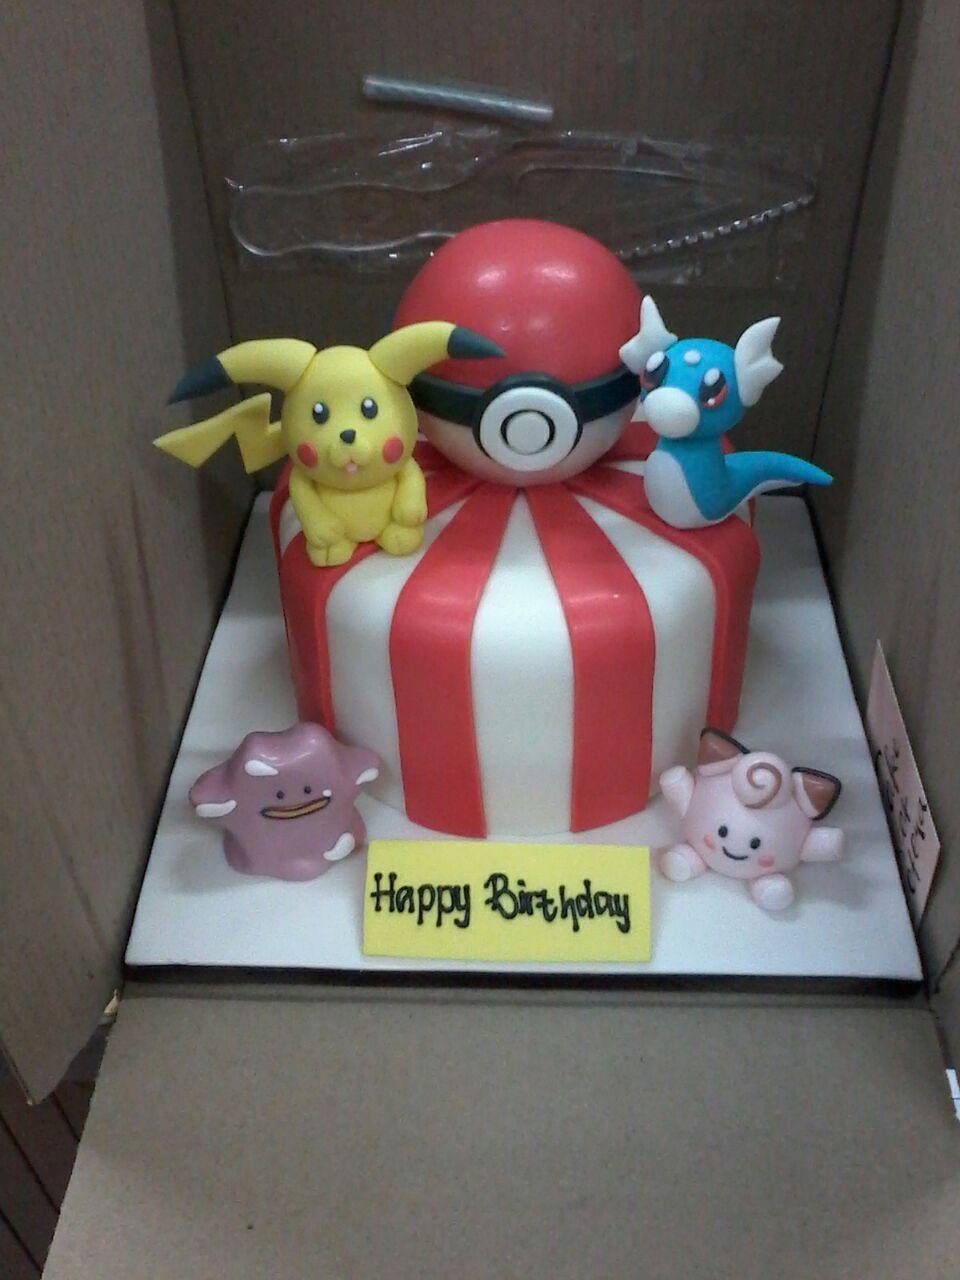 Realidad Pikachu Funny Cake Fails Wwwmiifotoscom